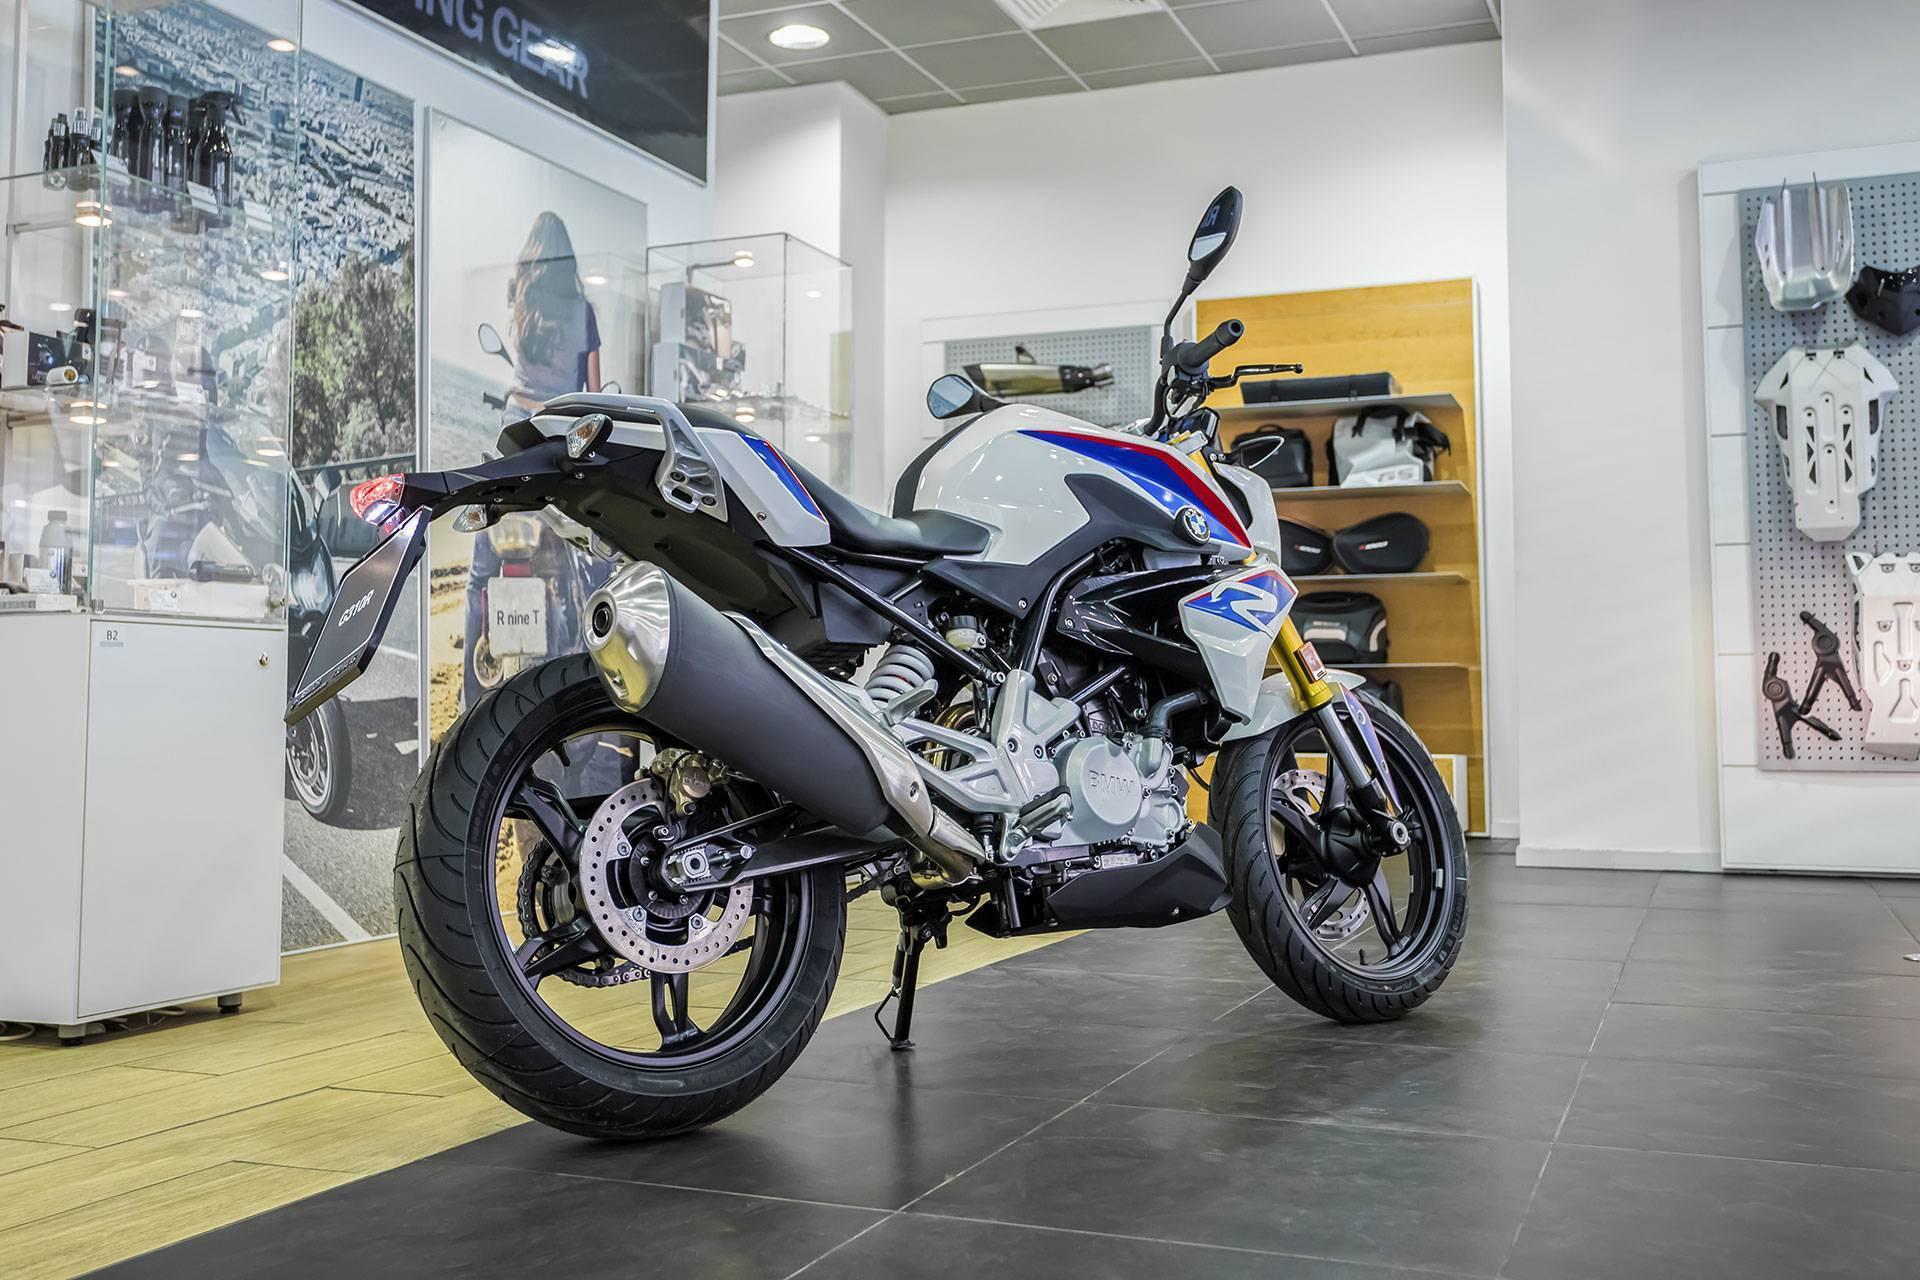 BMW G310R — нейкид-байк для начинающих